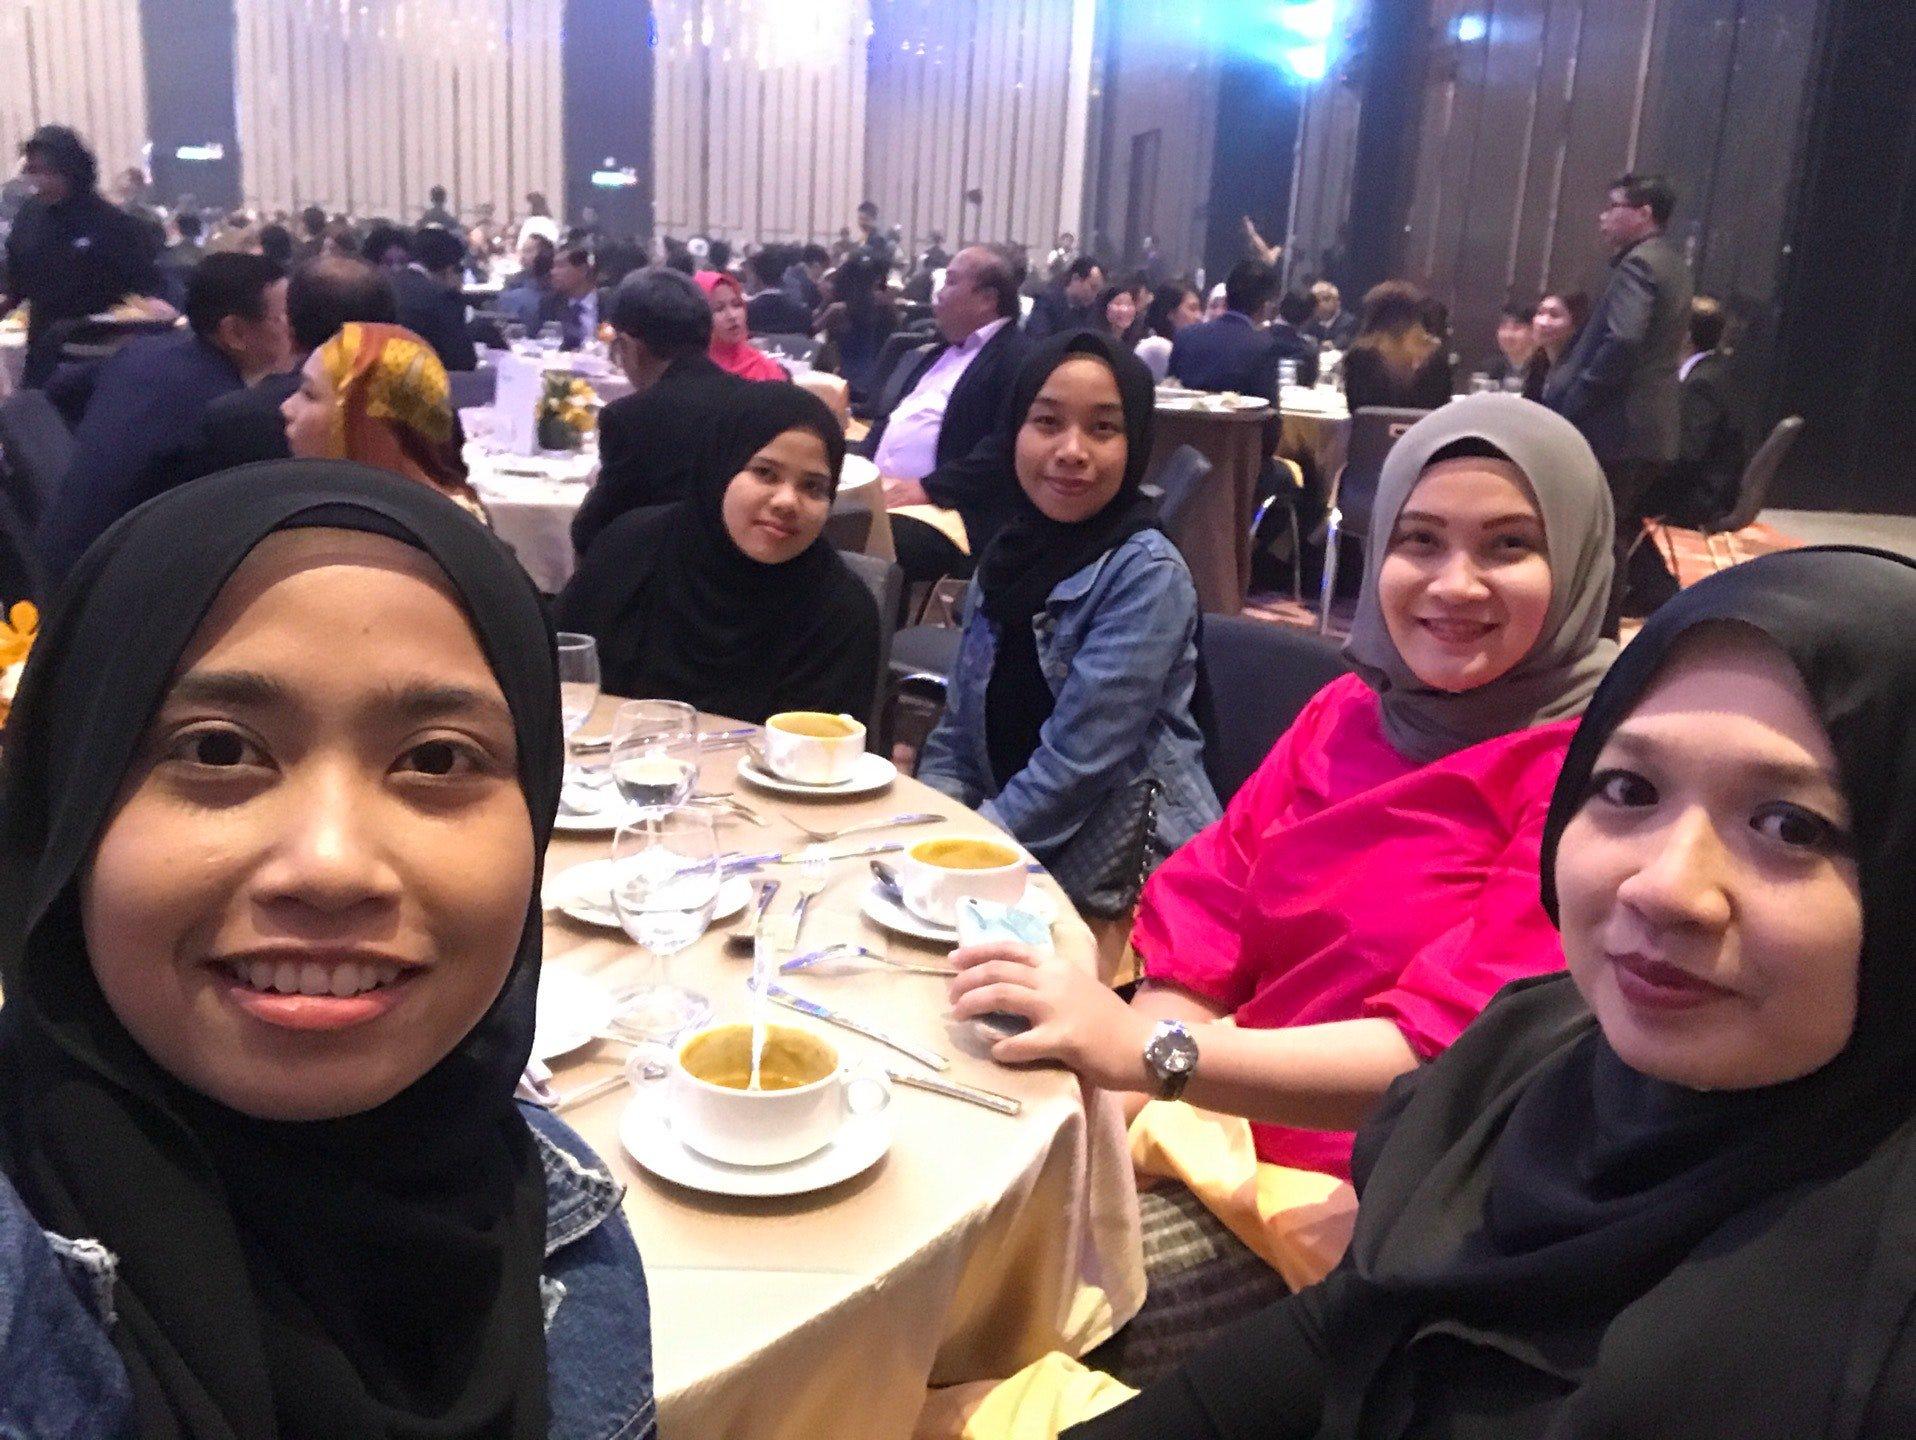 Annual Dinner Pertubuhan Akitek Malaysia (@ Grand Ballroom in Petaling Jaya, Selangor) https://t.co/EJtpQmwpu0 https://t.co/4wRy3F0qQh